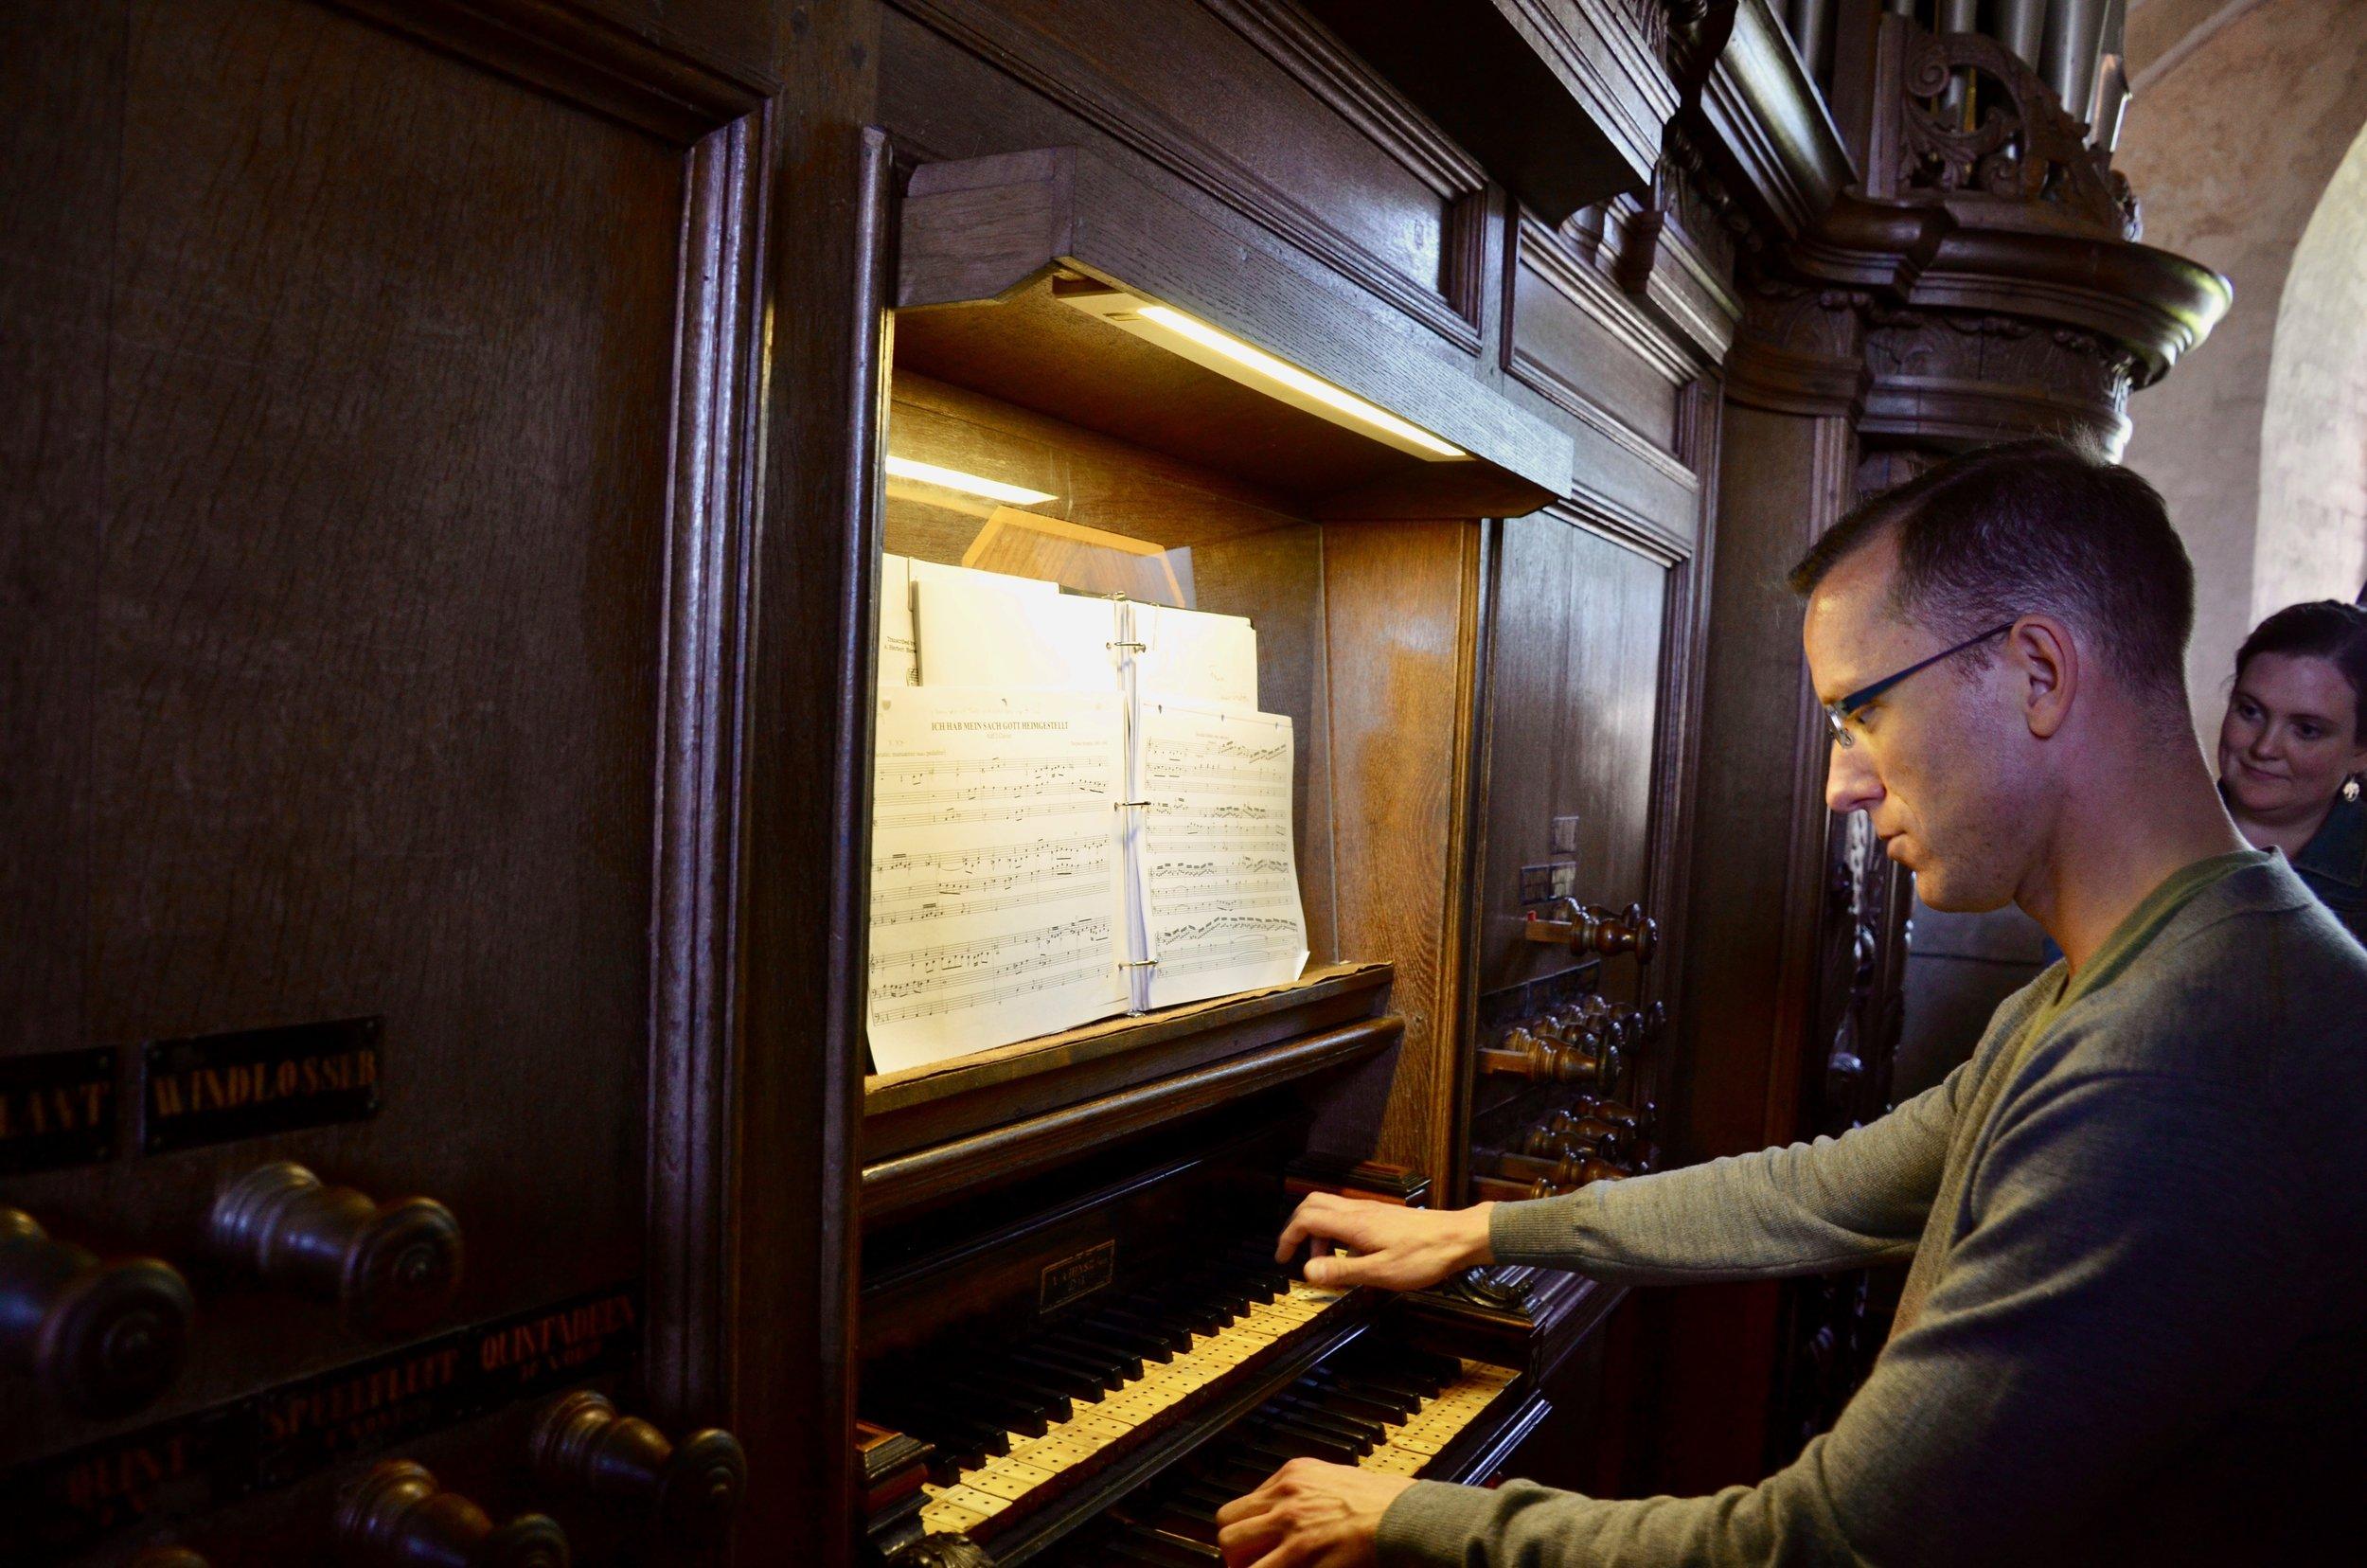 Christian Lane plays the 1733 Hinsz organ in Leens, Holland. Boston Organ Studio.